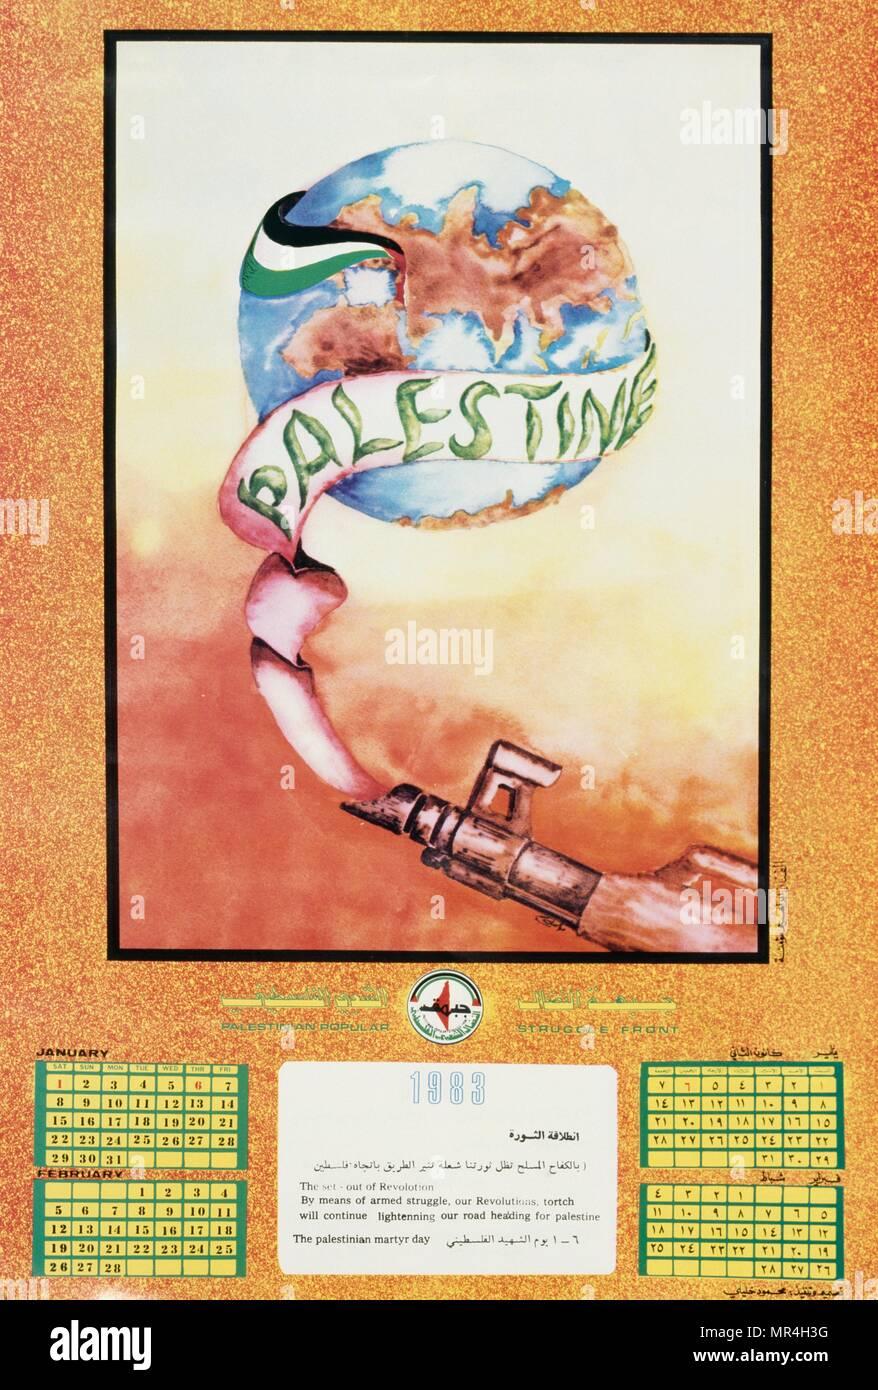 L'Organisation de libération de la Palestine (OLP) calendrier de la propagande contre le processus de paix avec Israël 1983 Photo Stock